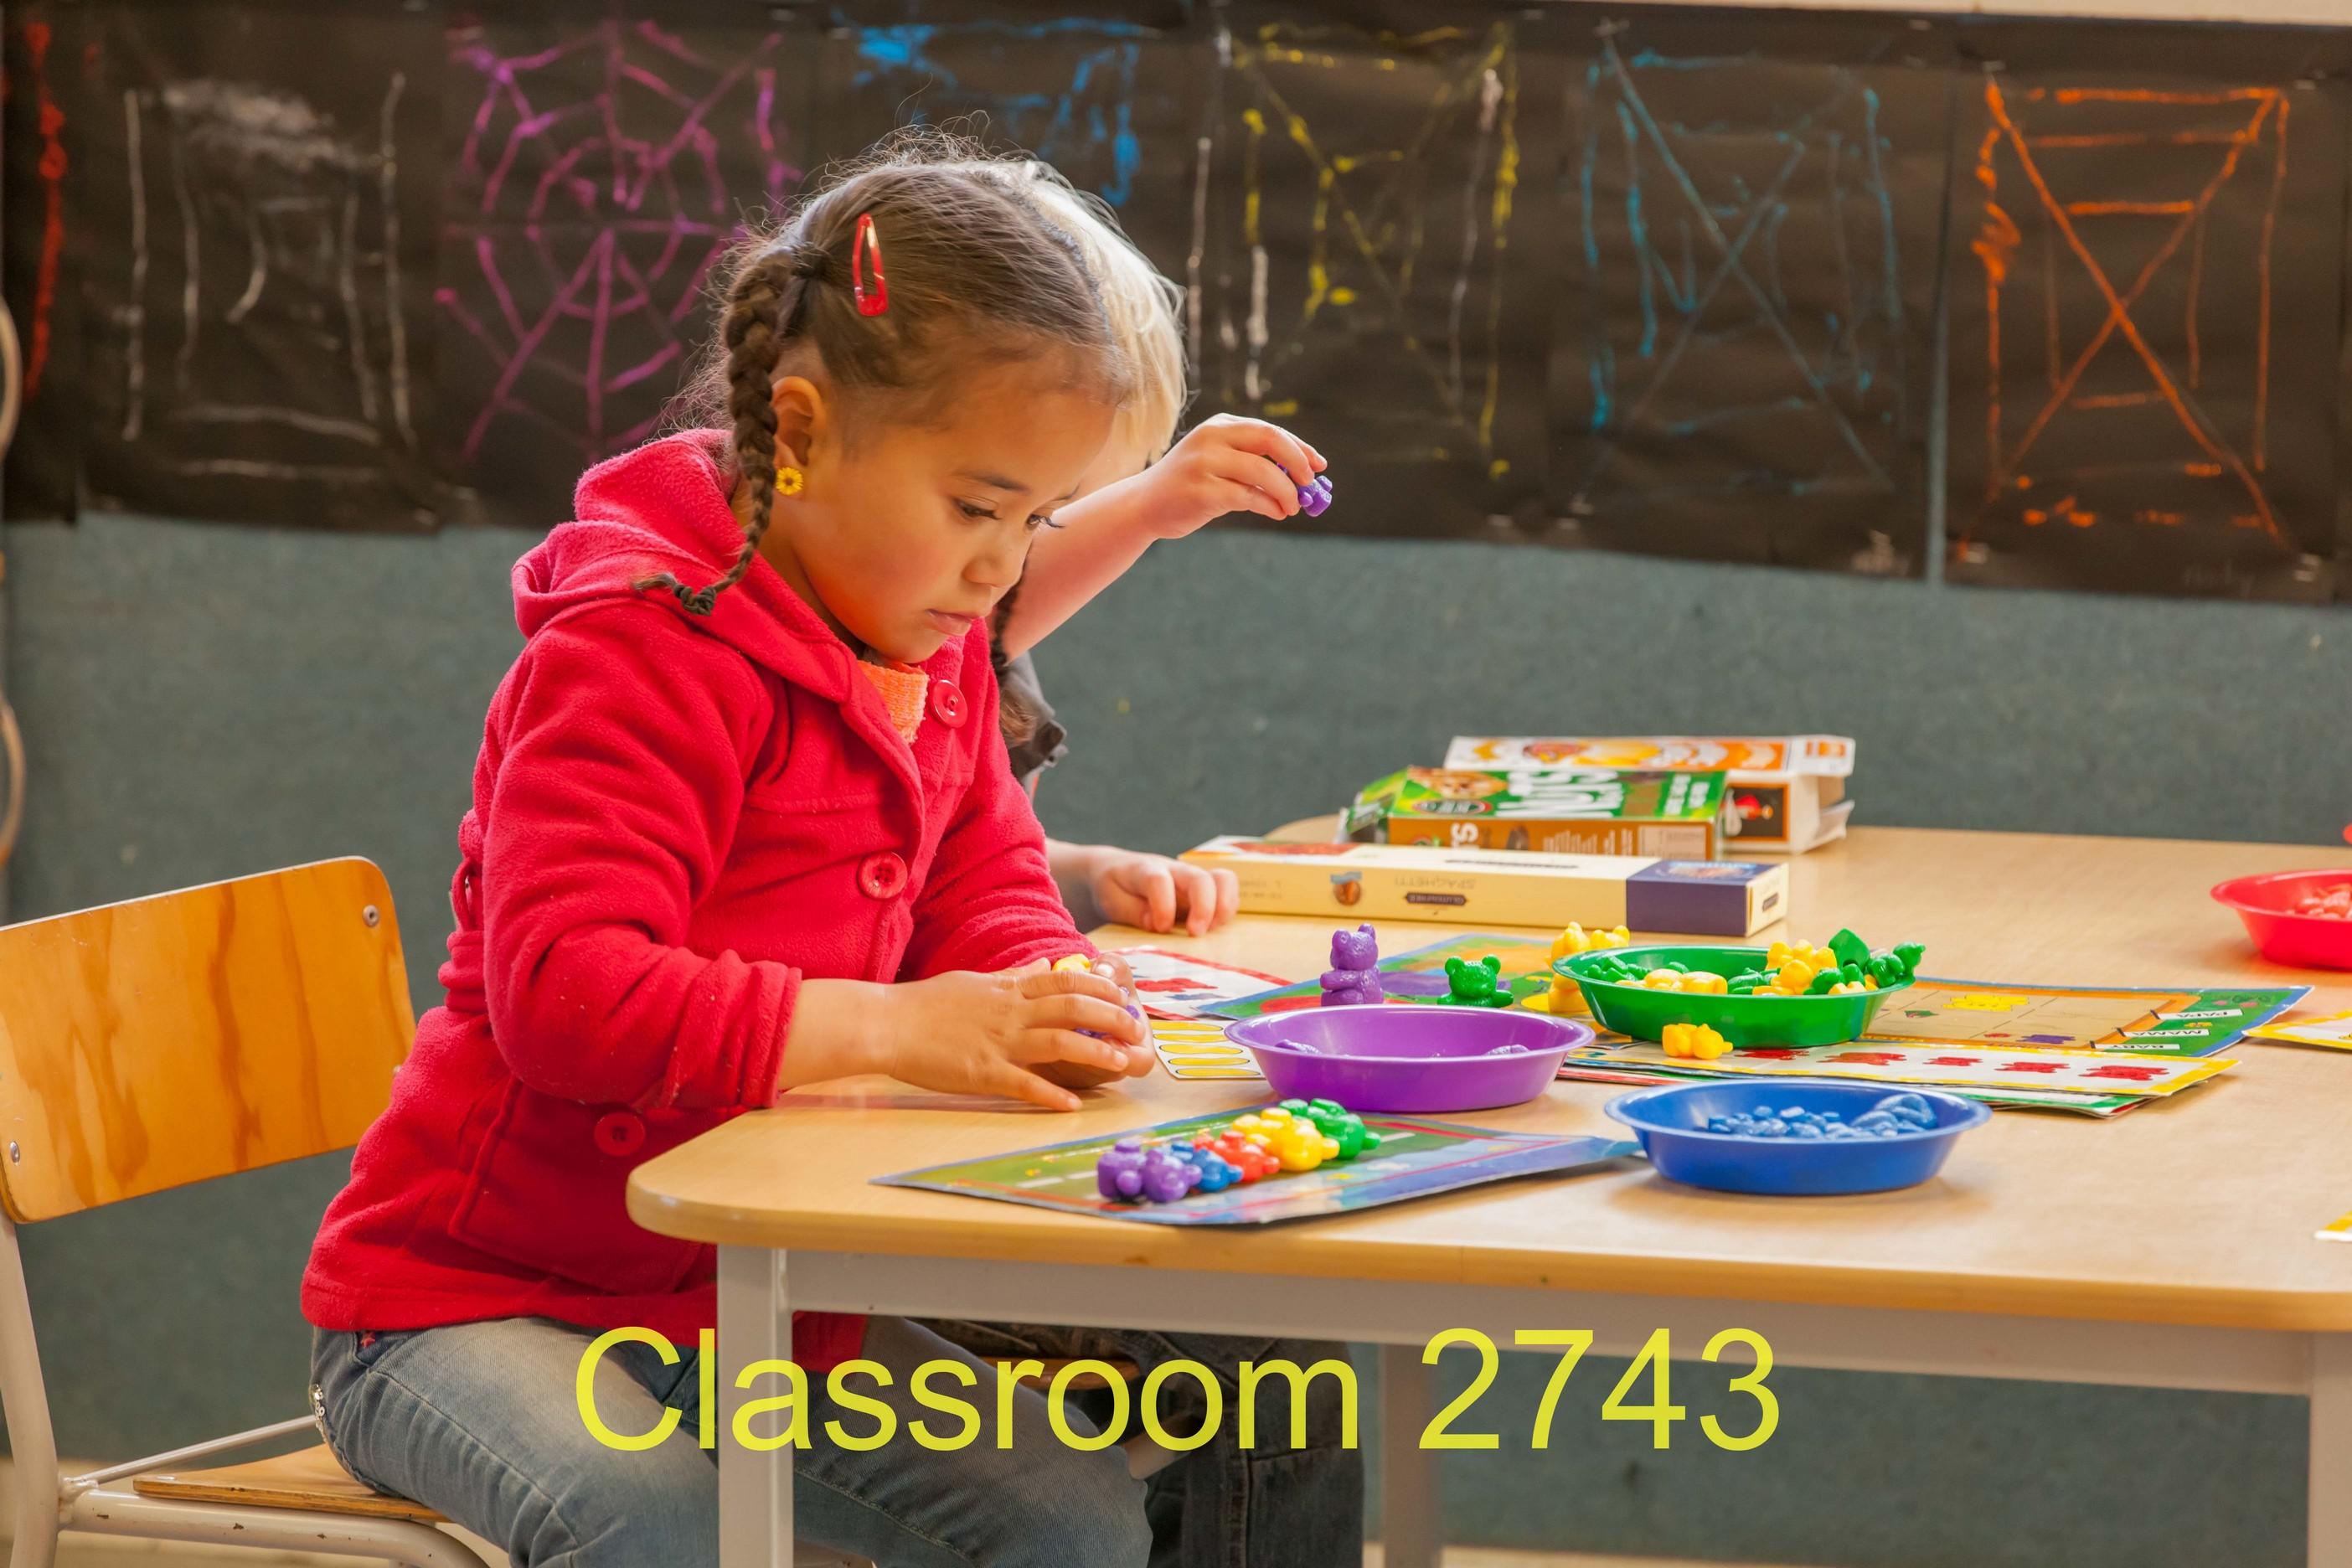 Classroom 2743